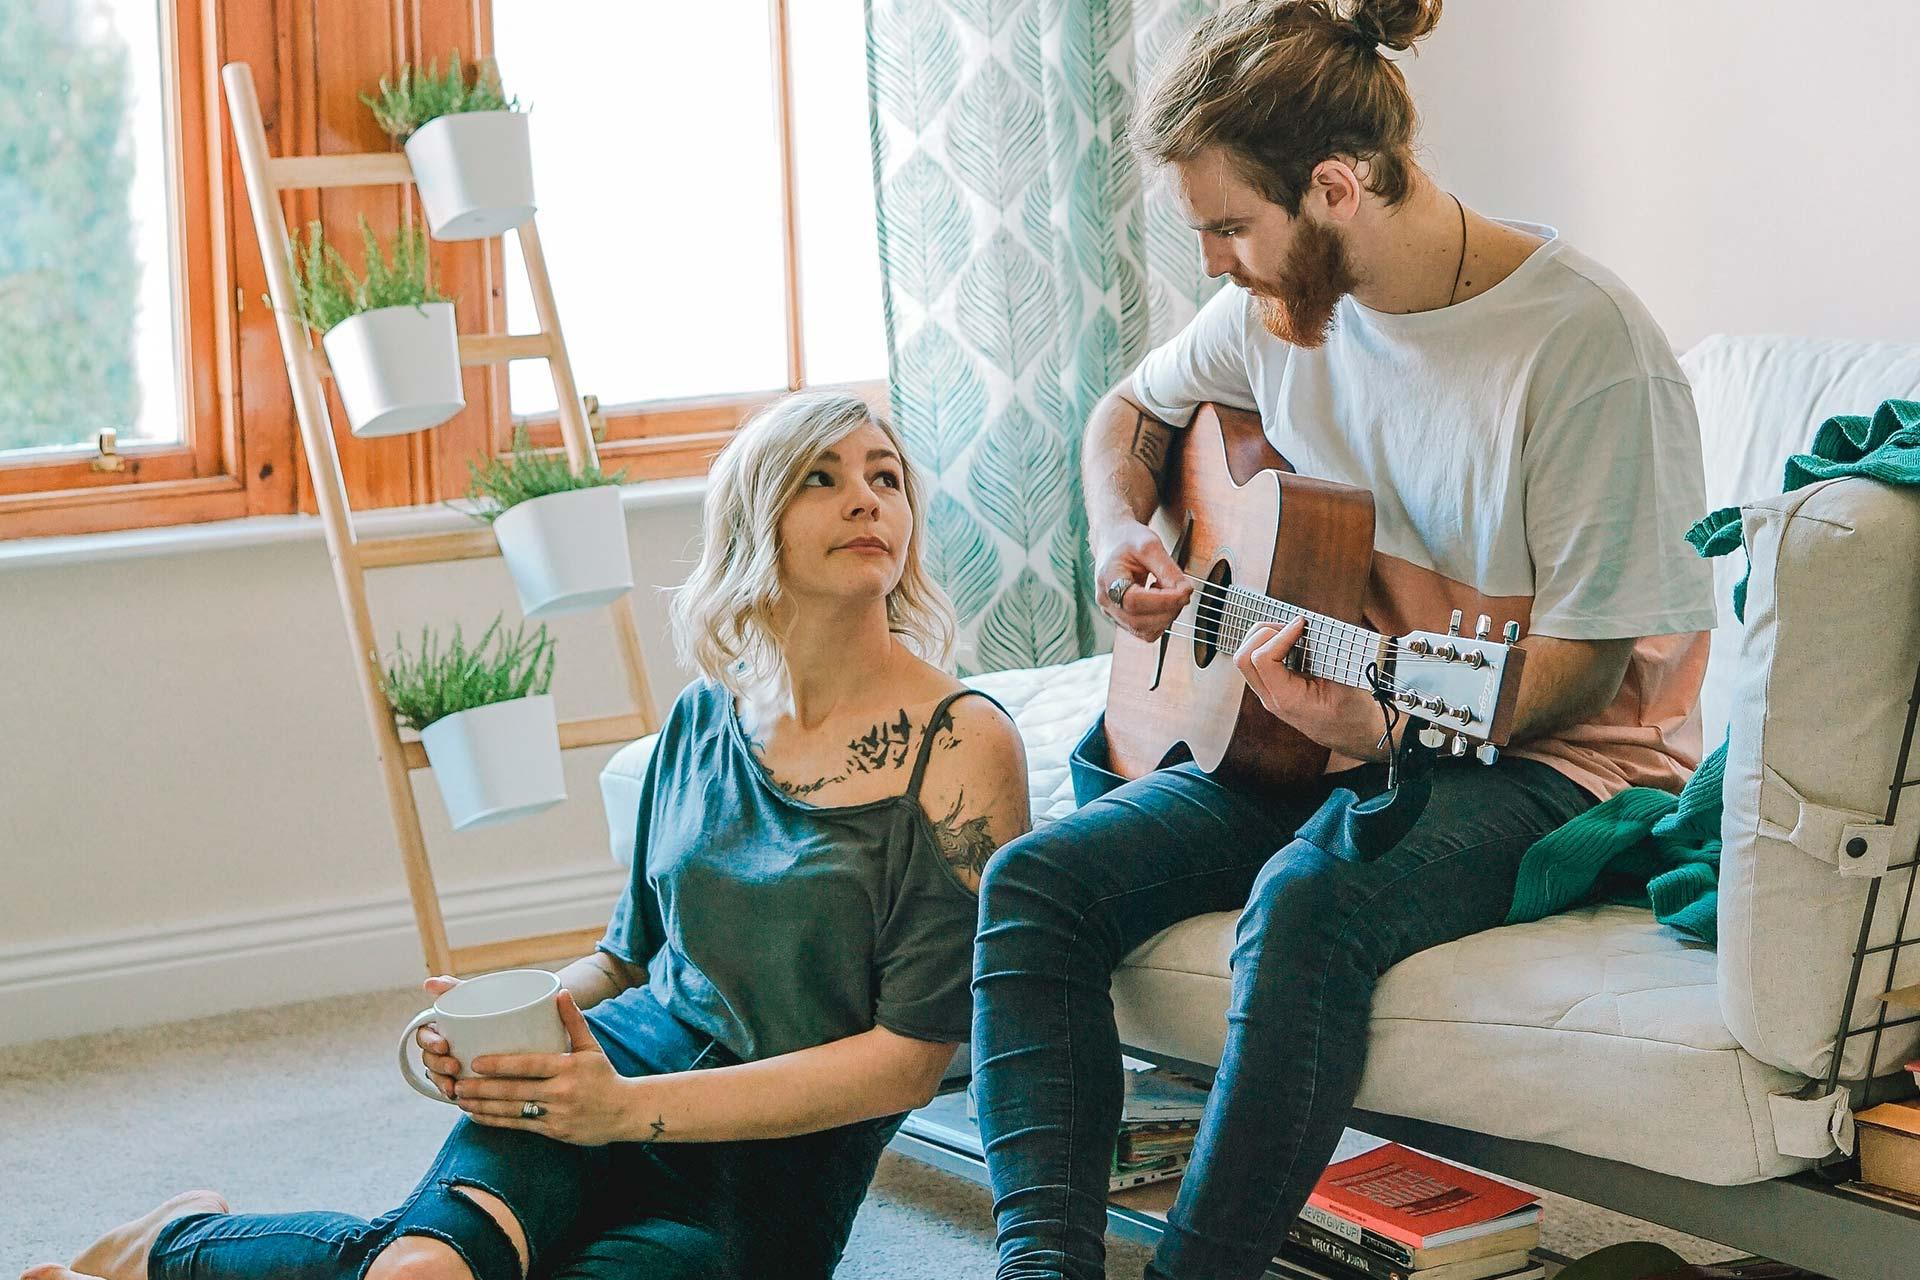 para-gra-na-gitarze-akustyczne-nauka